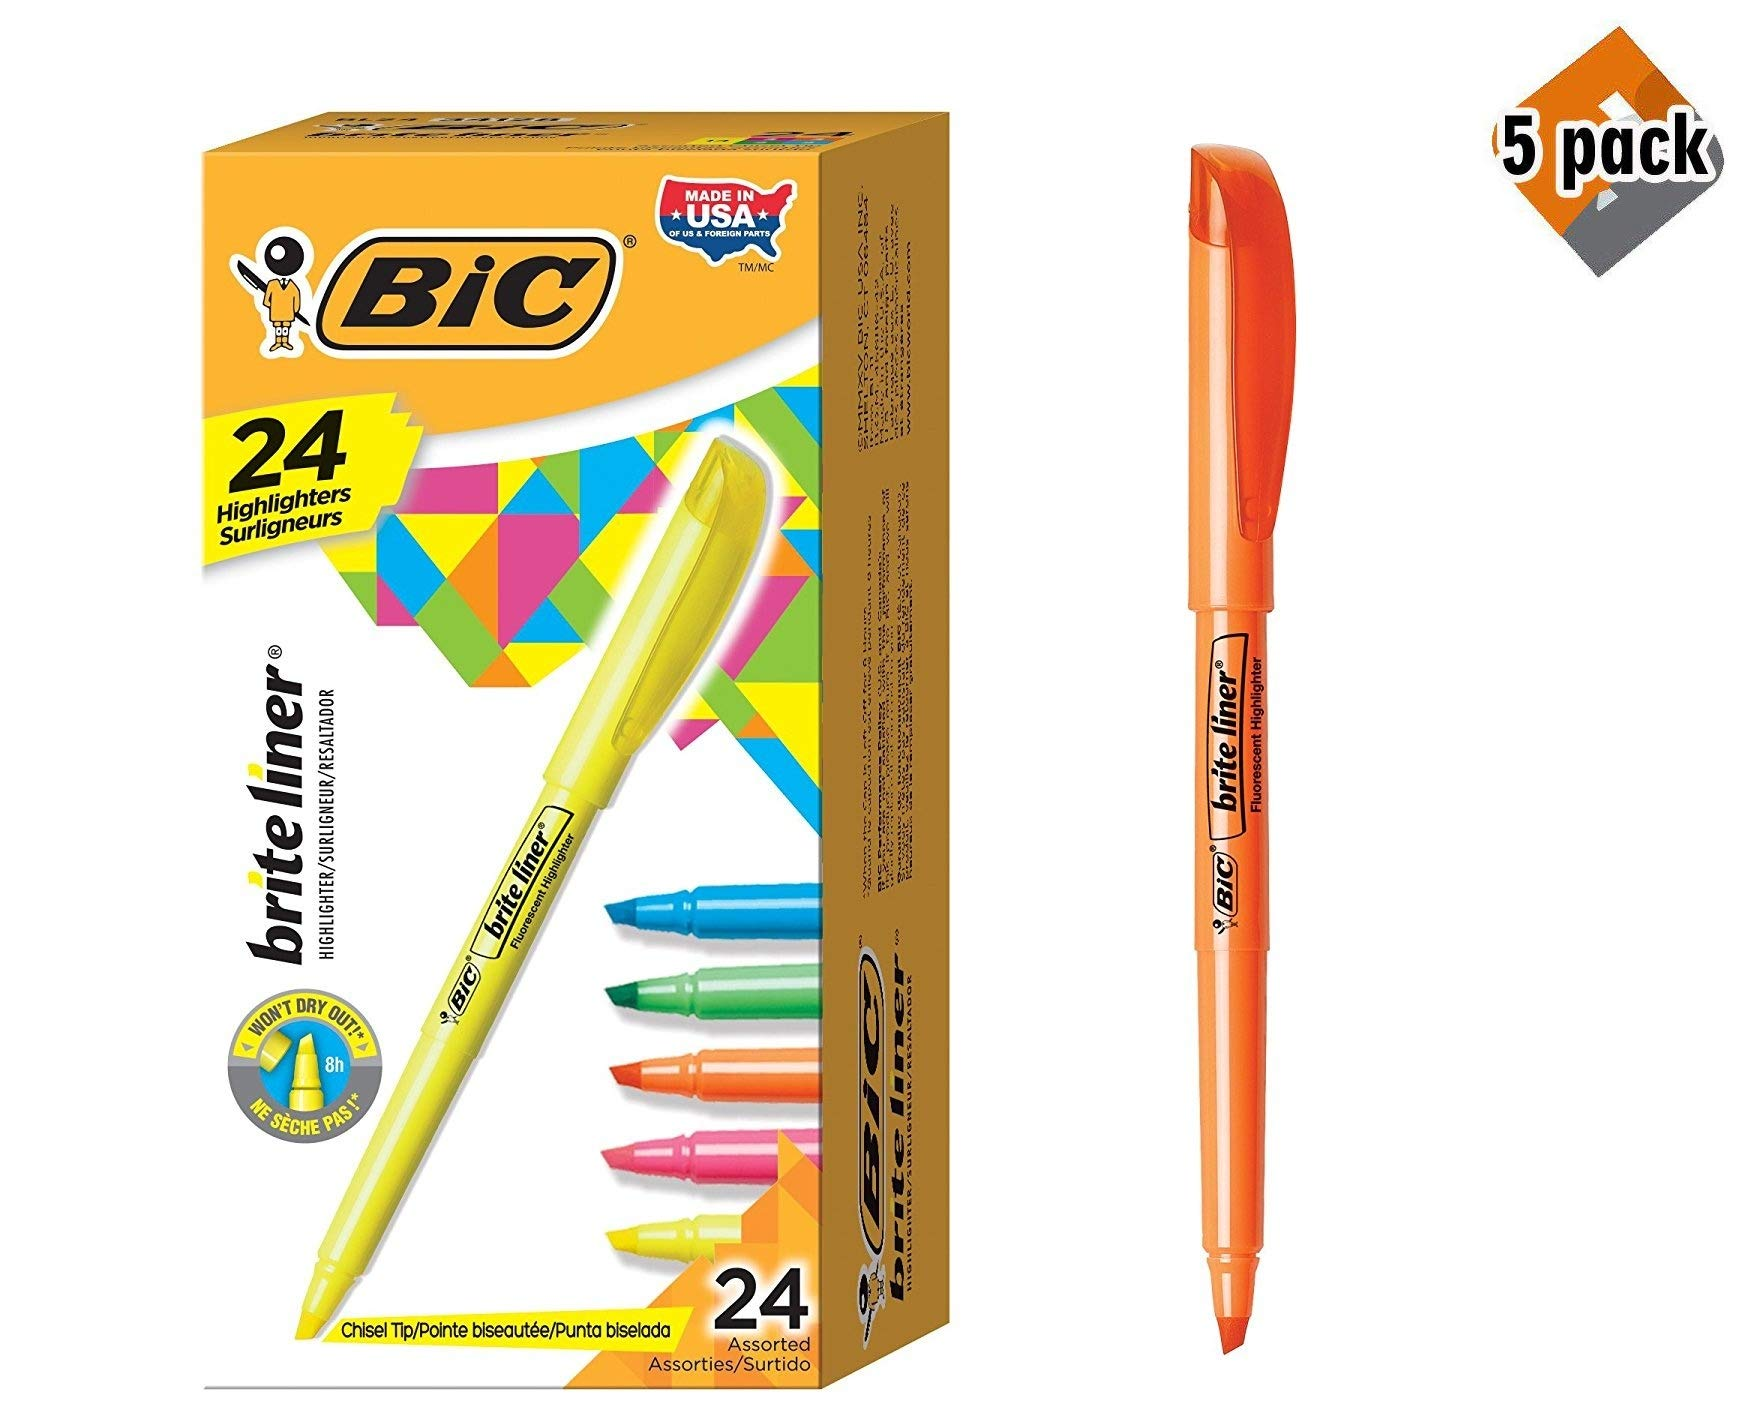 BIC Brite Liner Highlighter, Chisel Tip, Assorted Colors, 24-Count 5 Pack